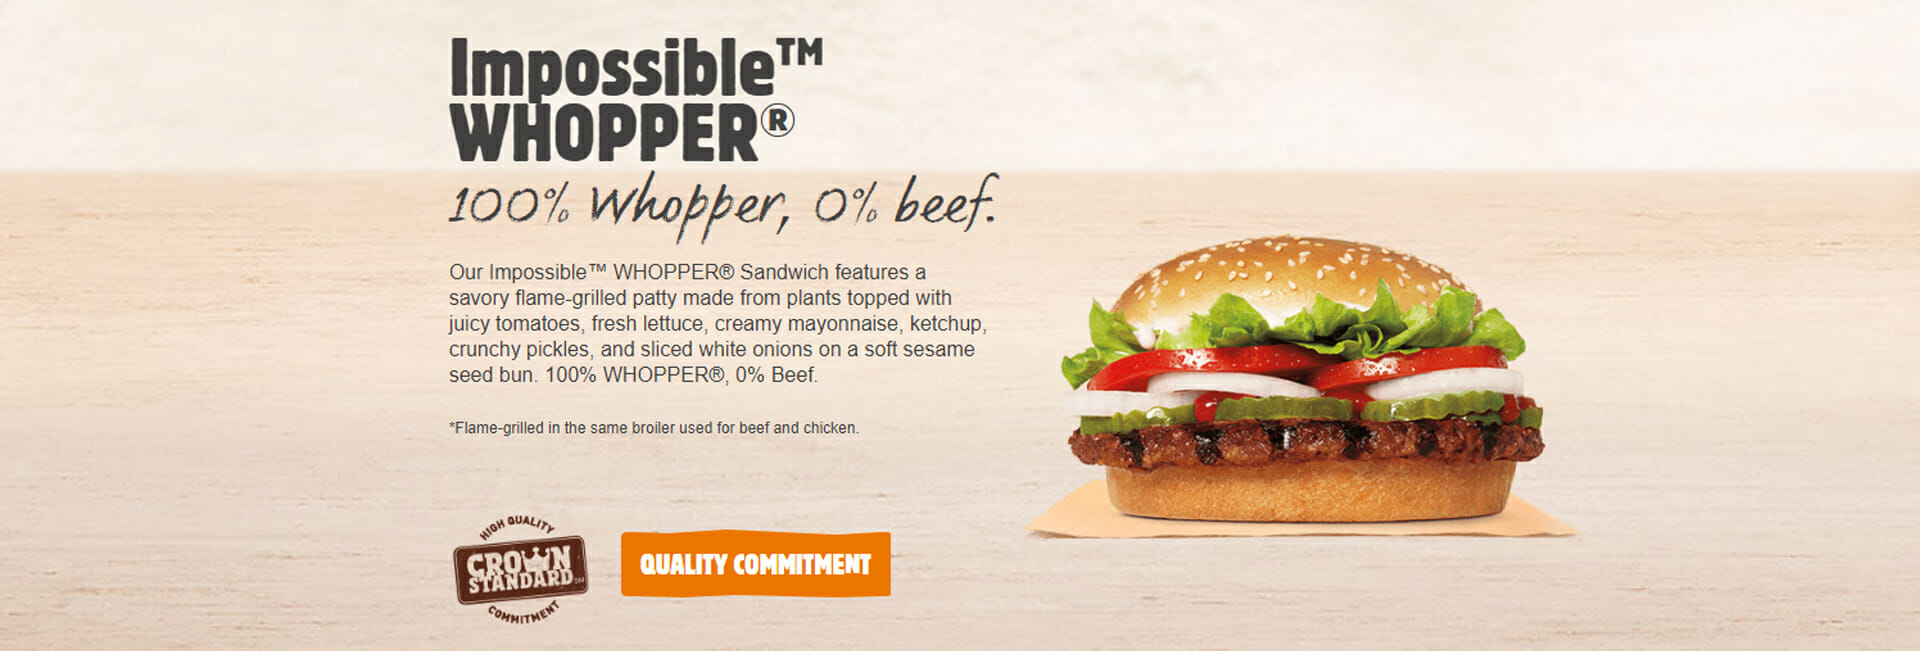 Impossible whopper vegan